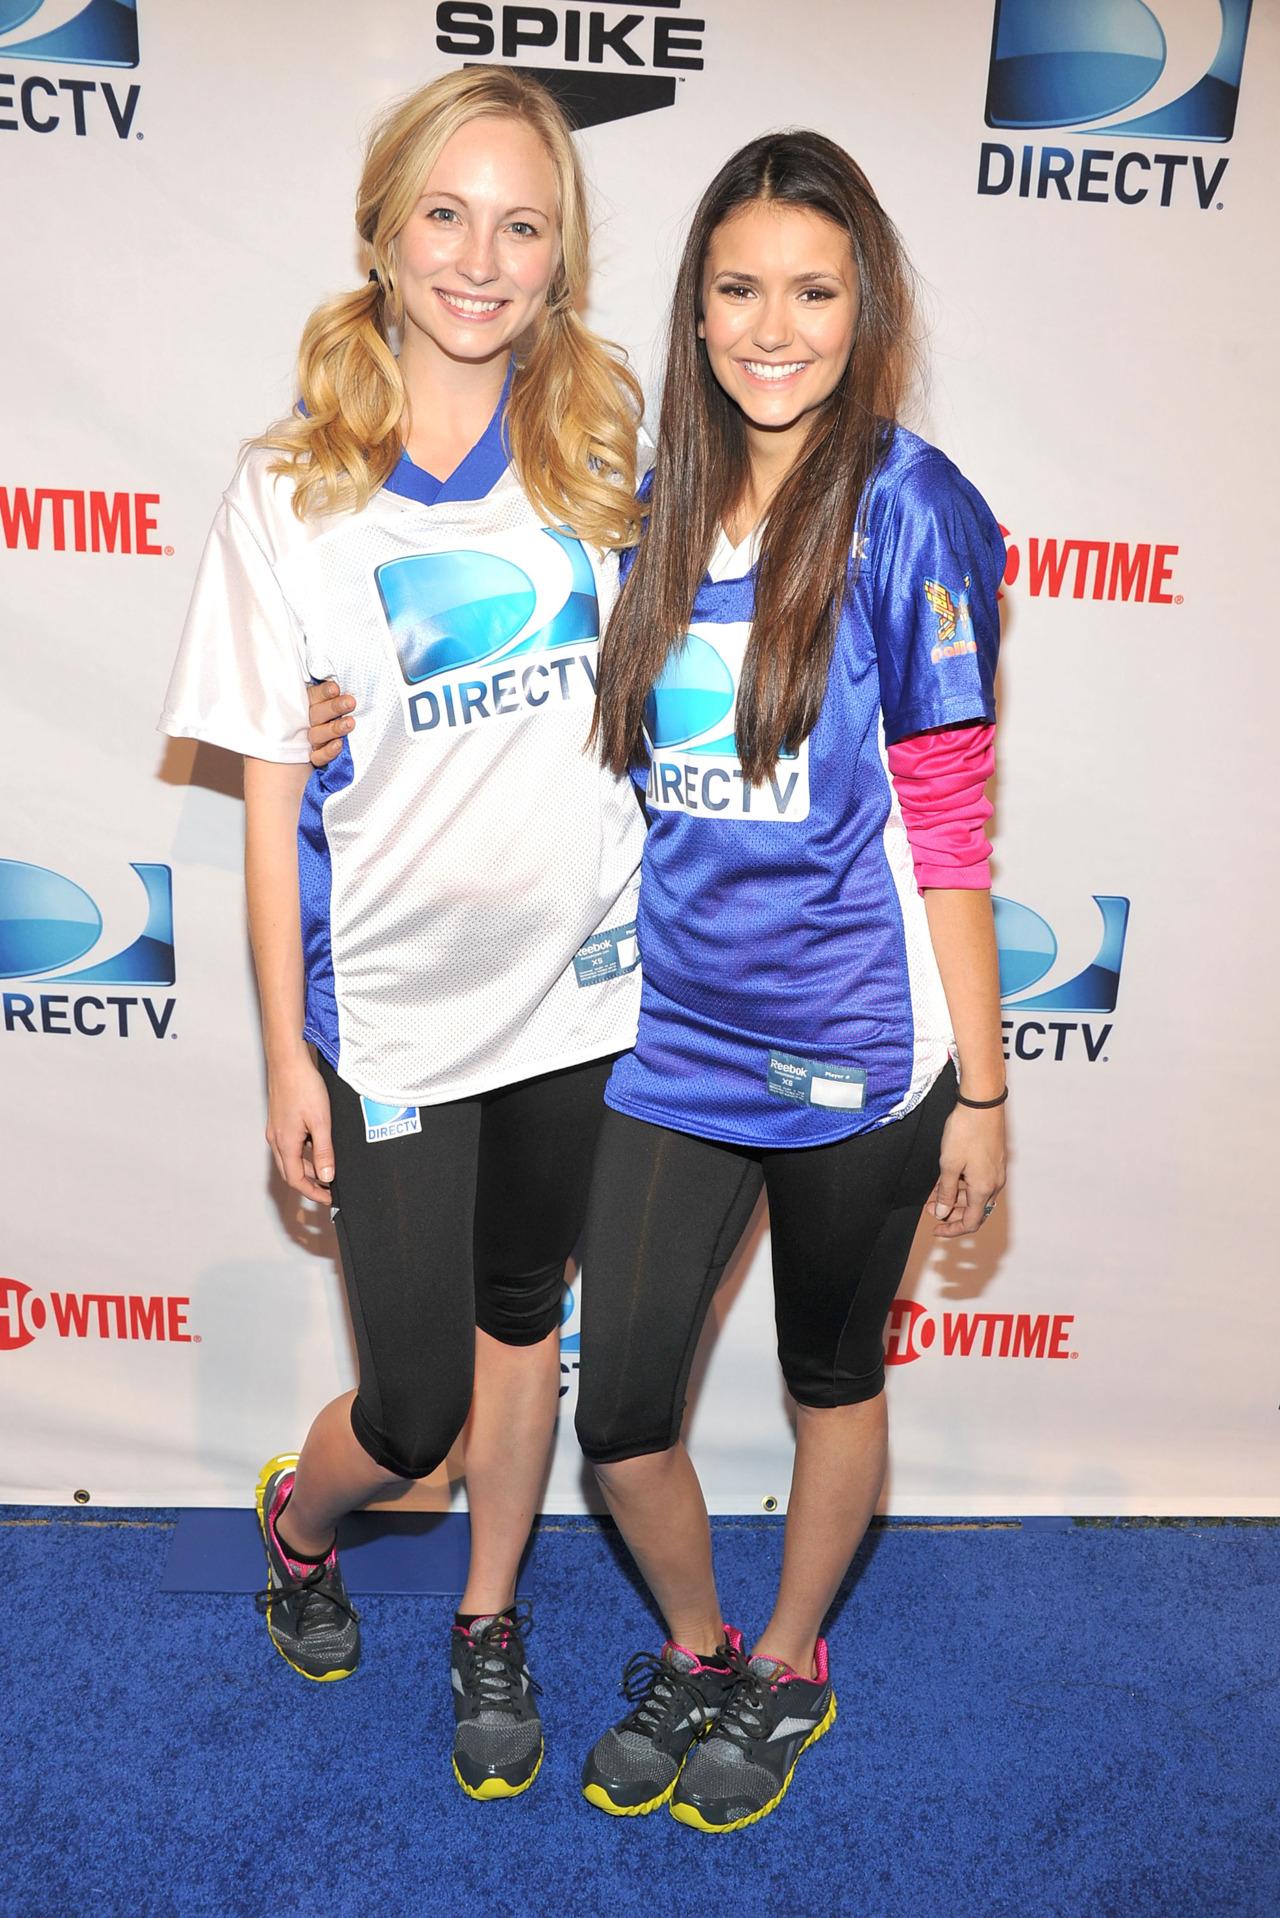 Nina & Candice at DIRECTV's Celebrity Beach Bowl